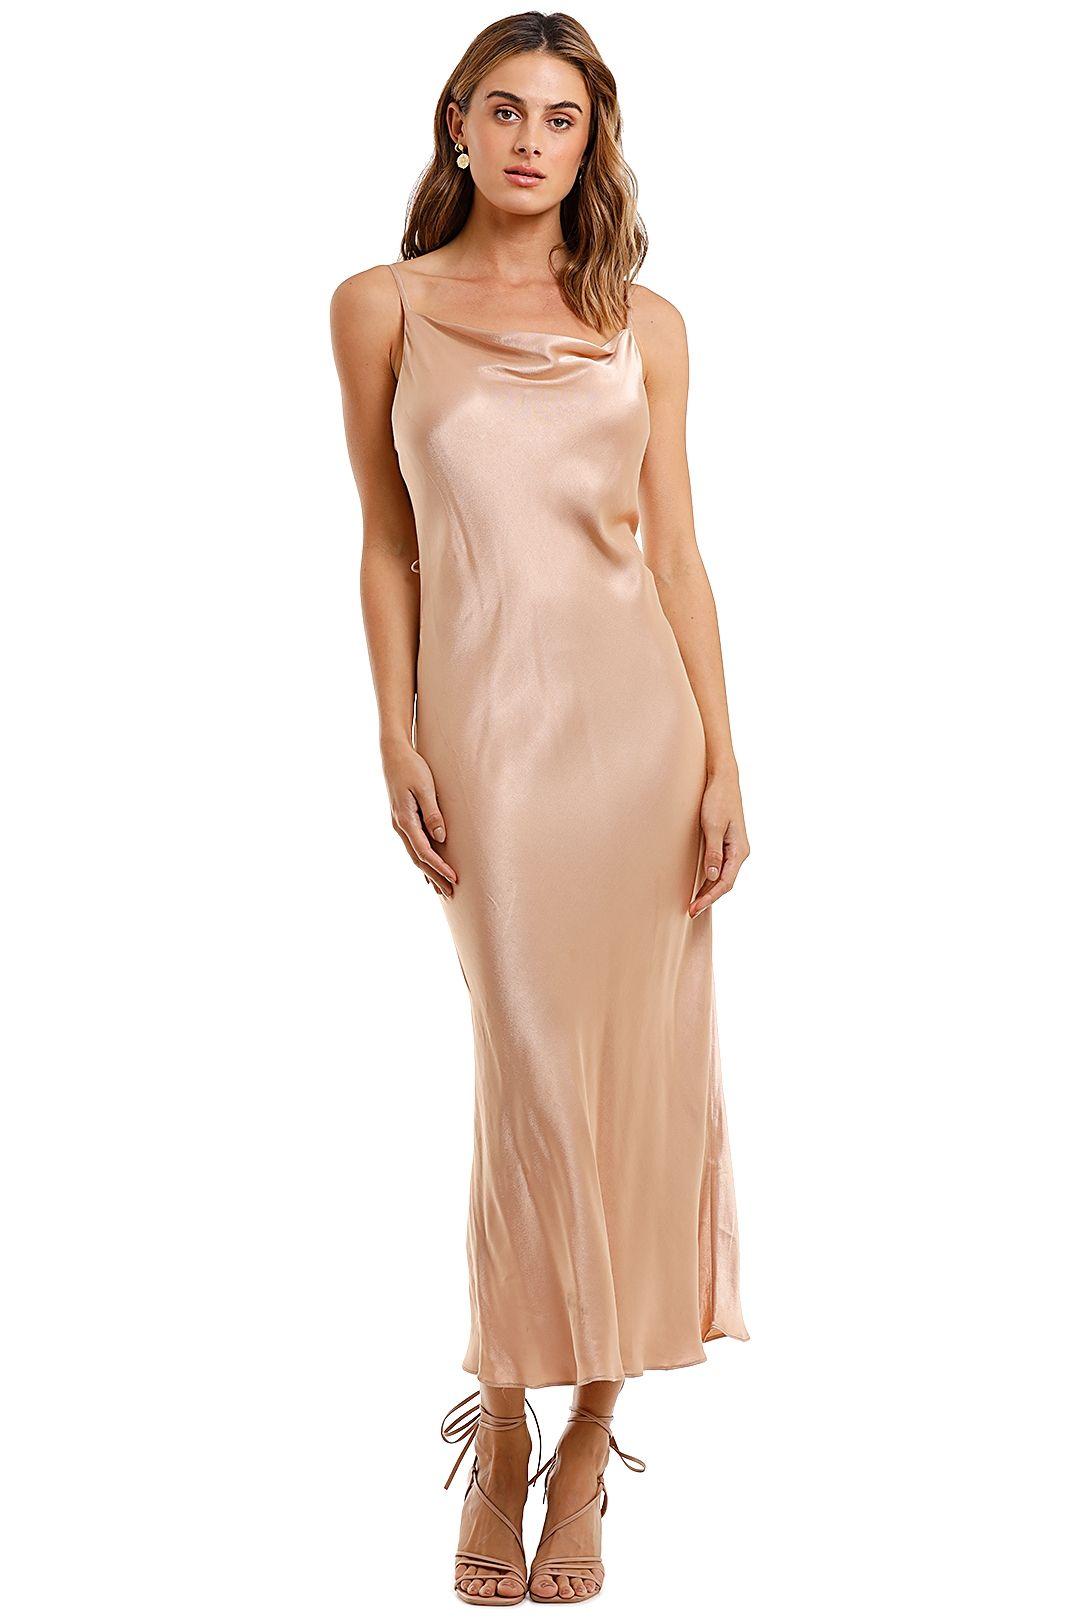 Shona Joy Bias Cowl Midi Dress Dessert Rose